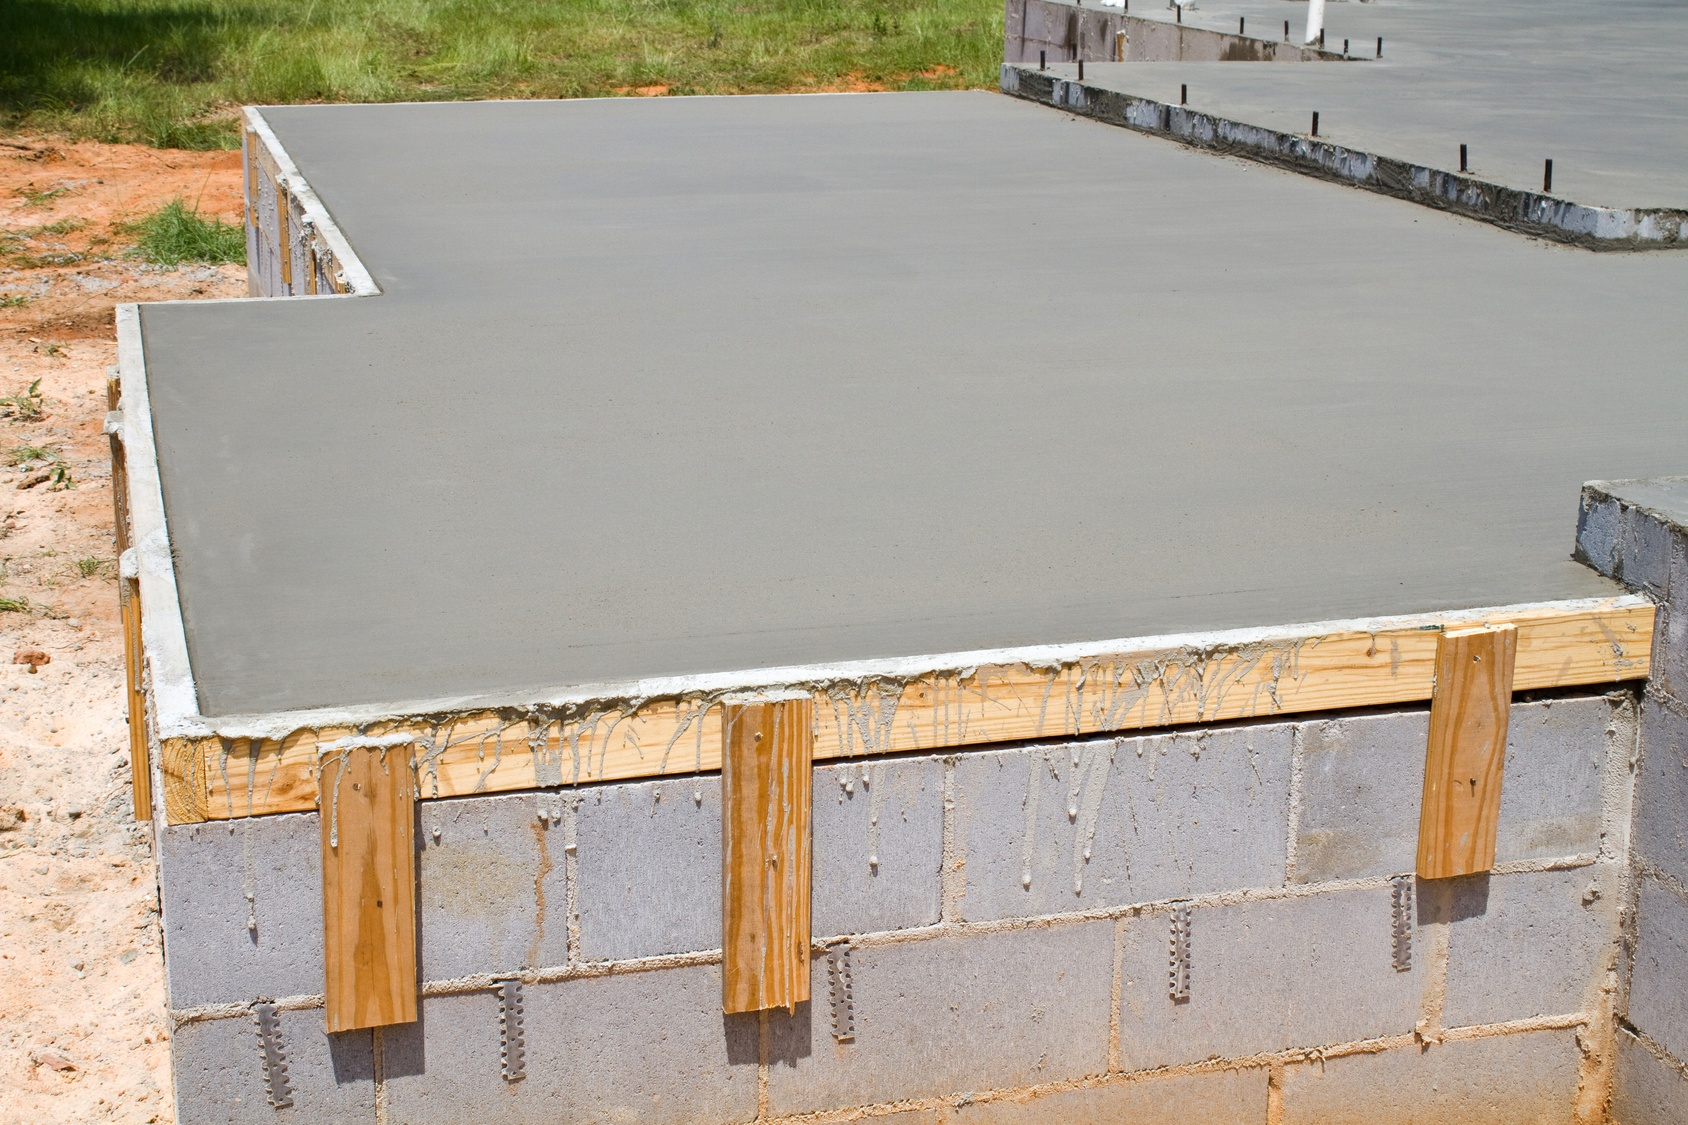 concrete slab for testing rh